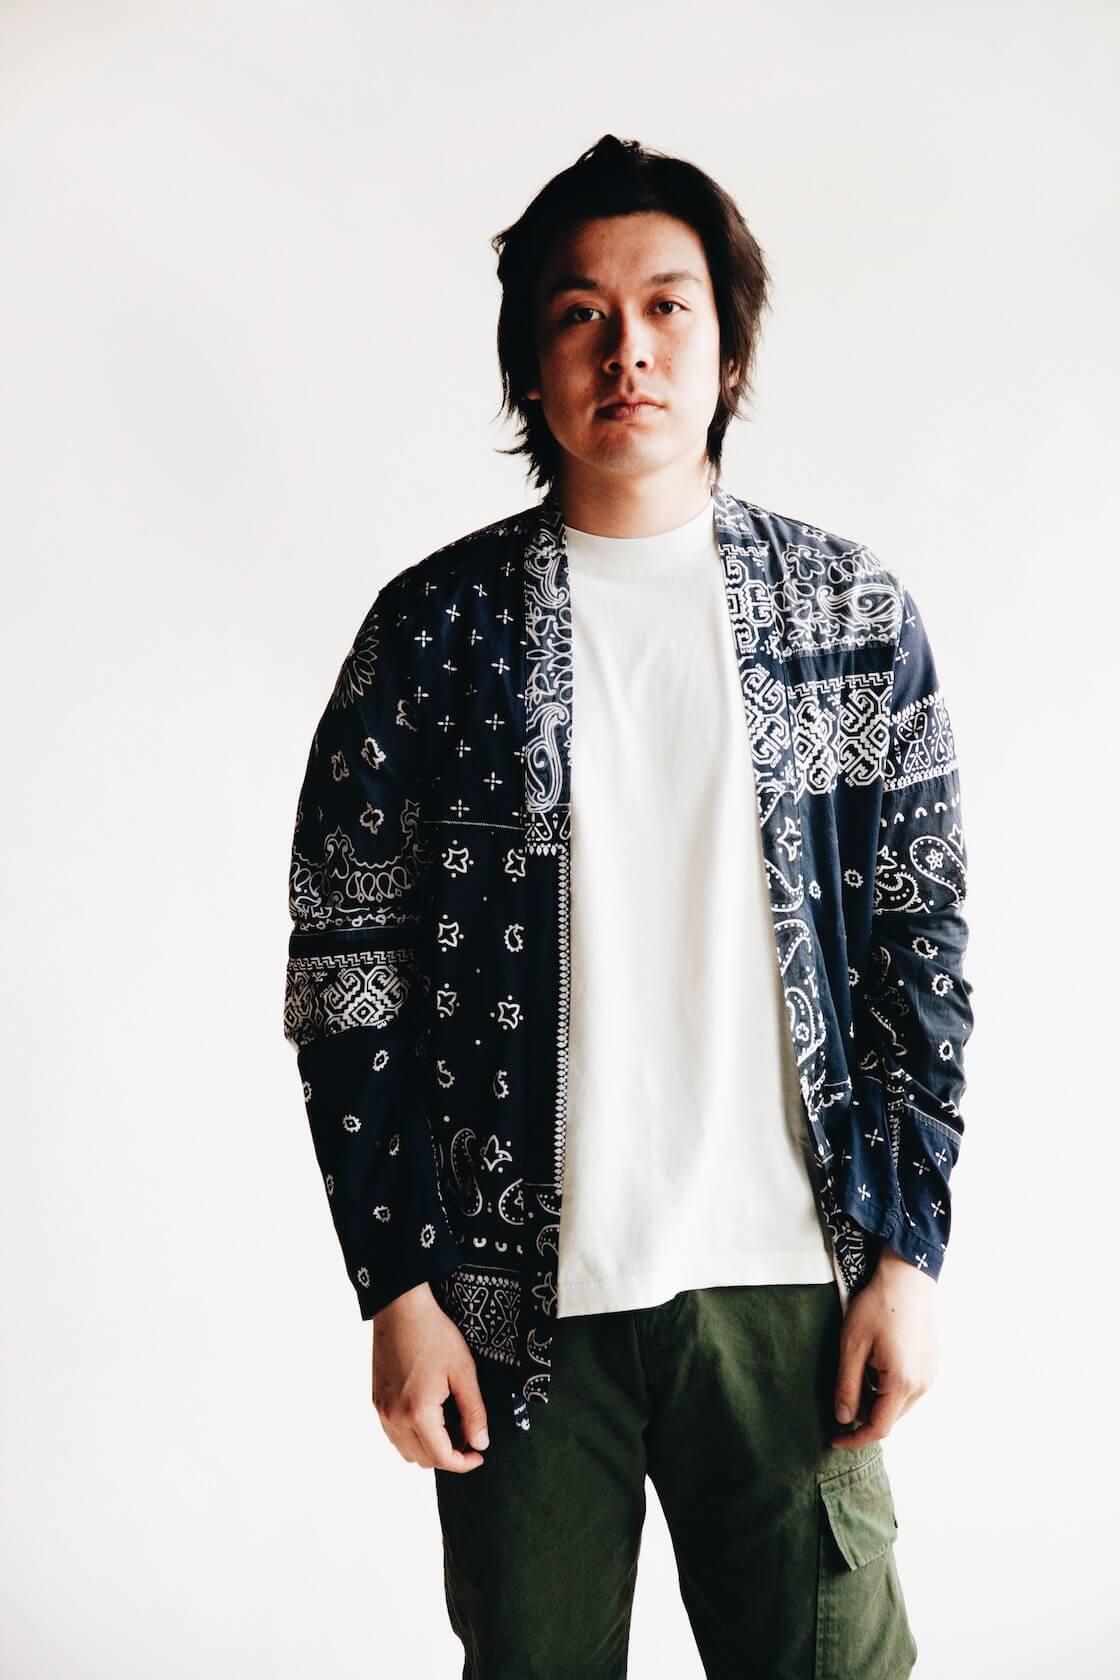 kapital clothing japan bandana inspired garment from ss20